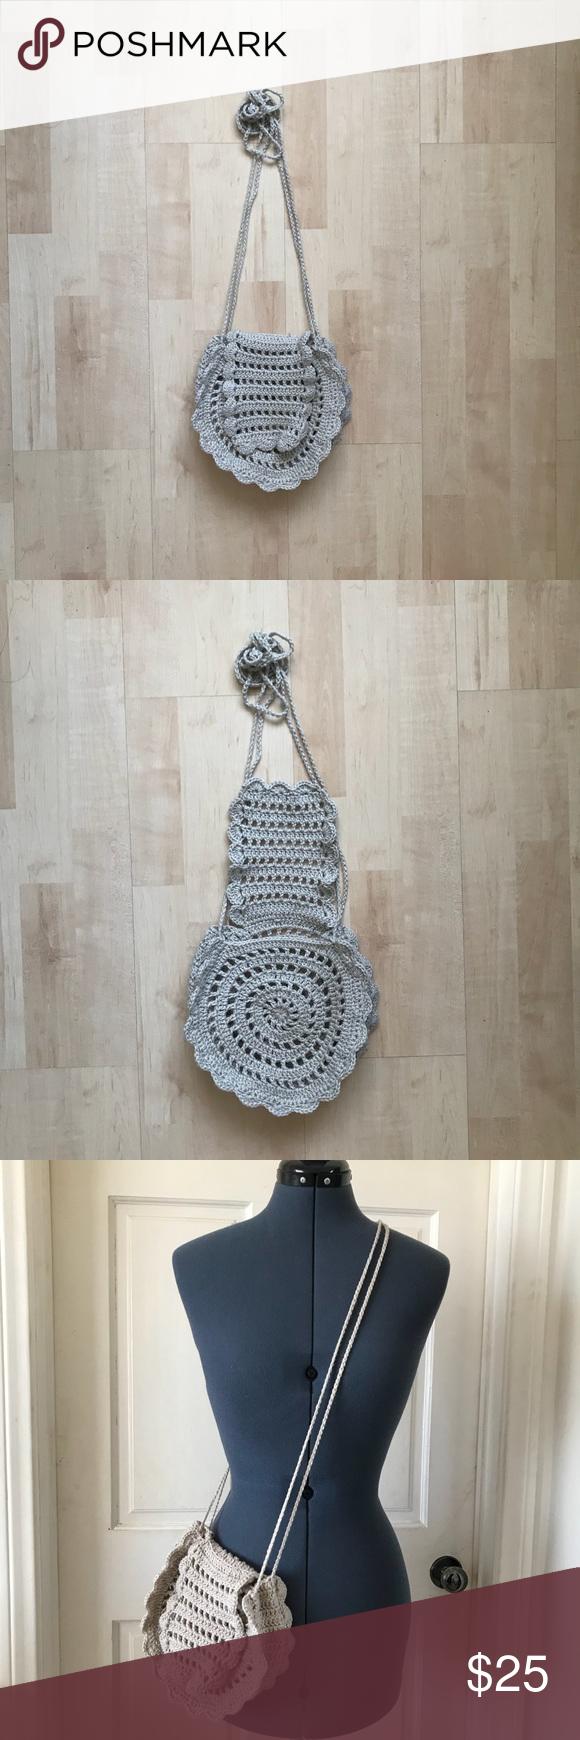 Crochet bag Crochet bag 100 acrylic No lining